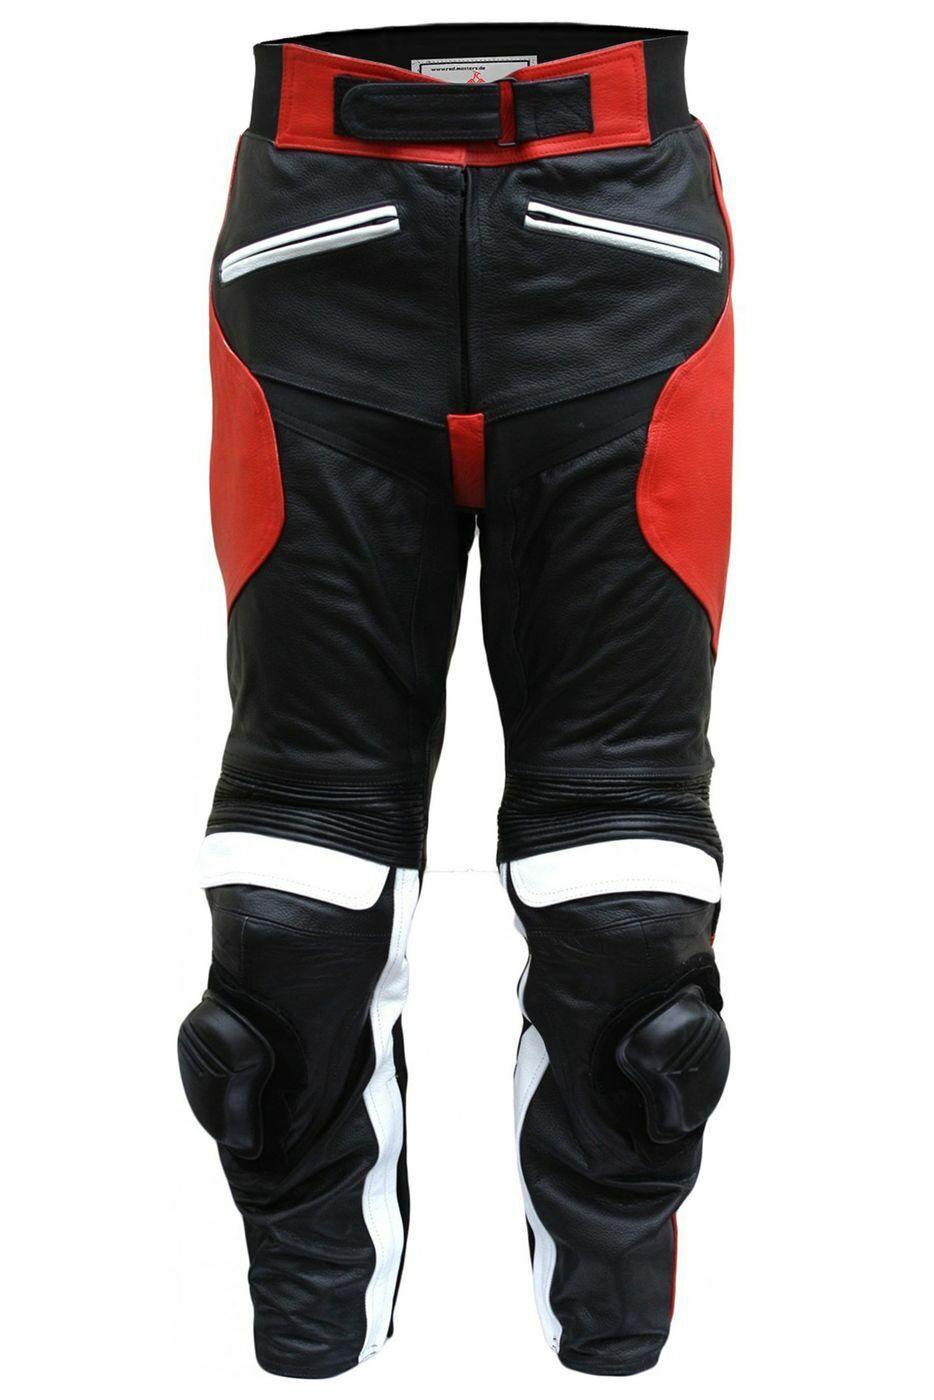 German Wear, Damen Motorrad-Lederhose Biker Hose Rindsleder Schwarz/Rot/Weiß